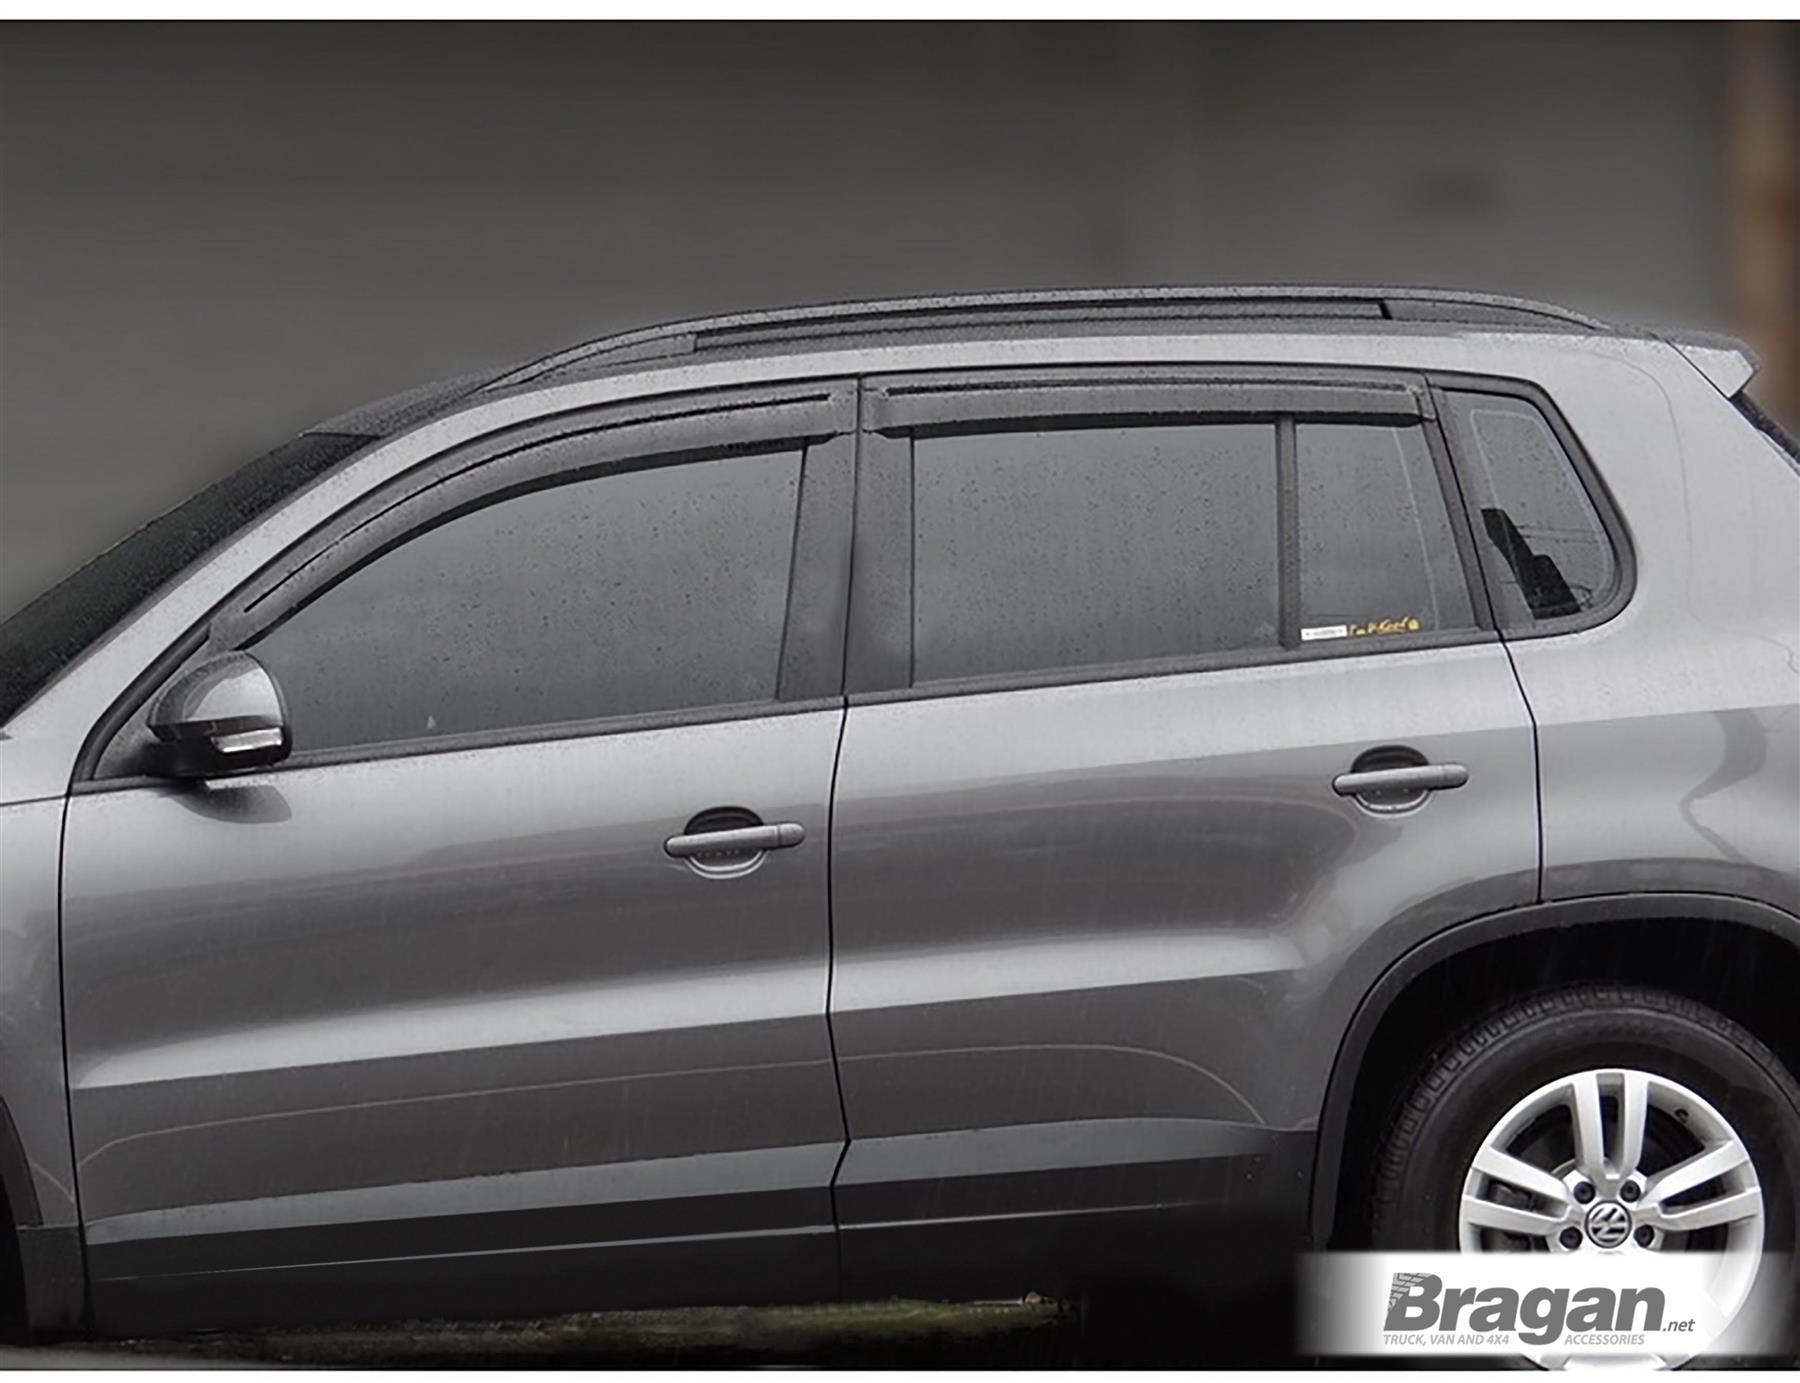 Bragan BRAH41078 SUV 4x4 Tinted Window Deflectors Fitting Kit Sun Rain Wind Protector Smoked Acrylic